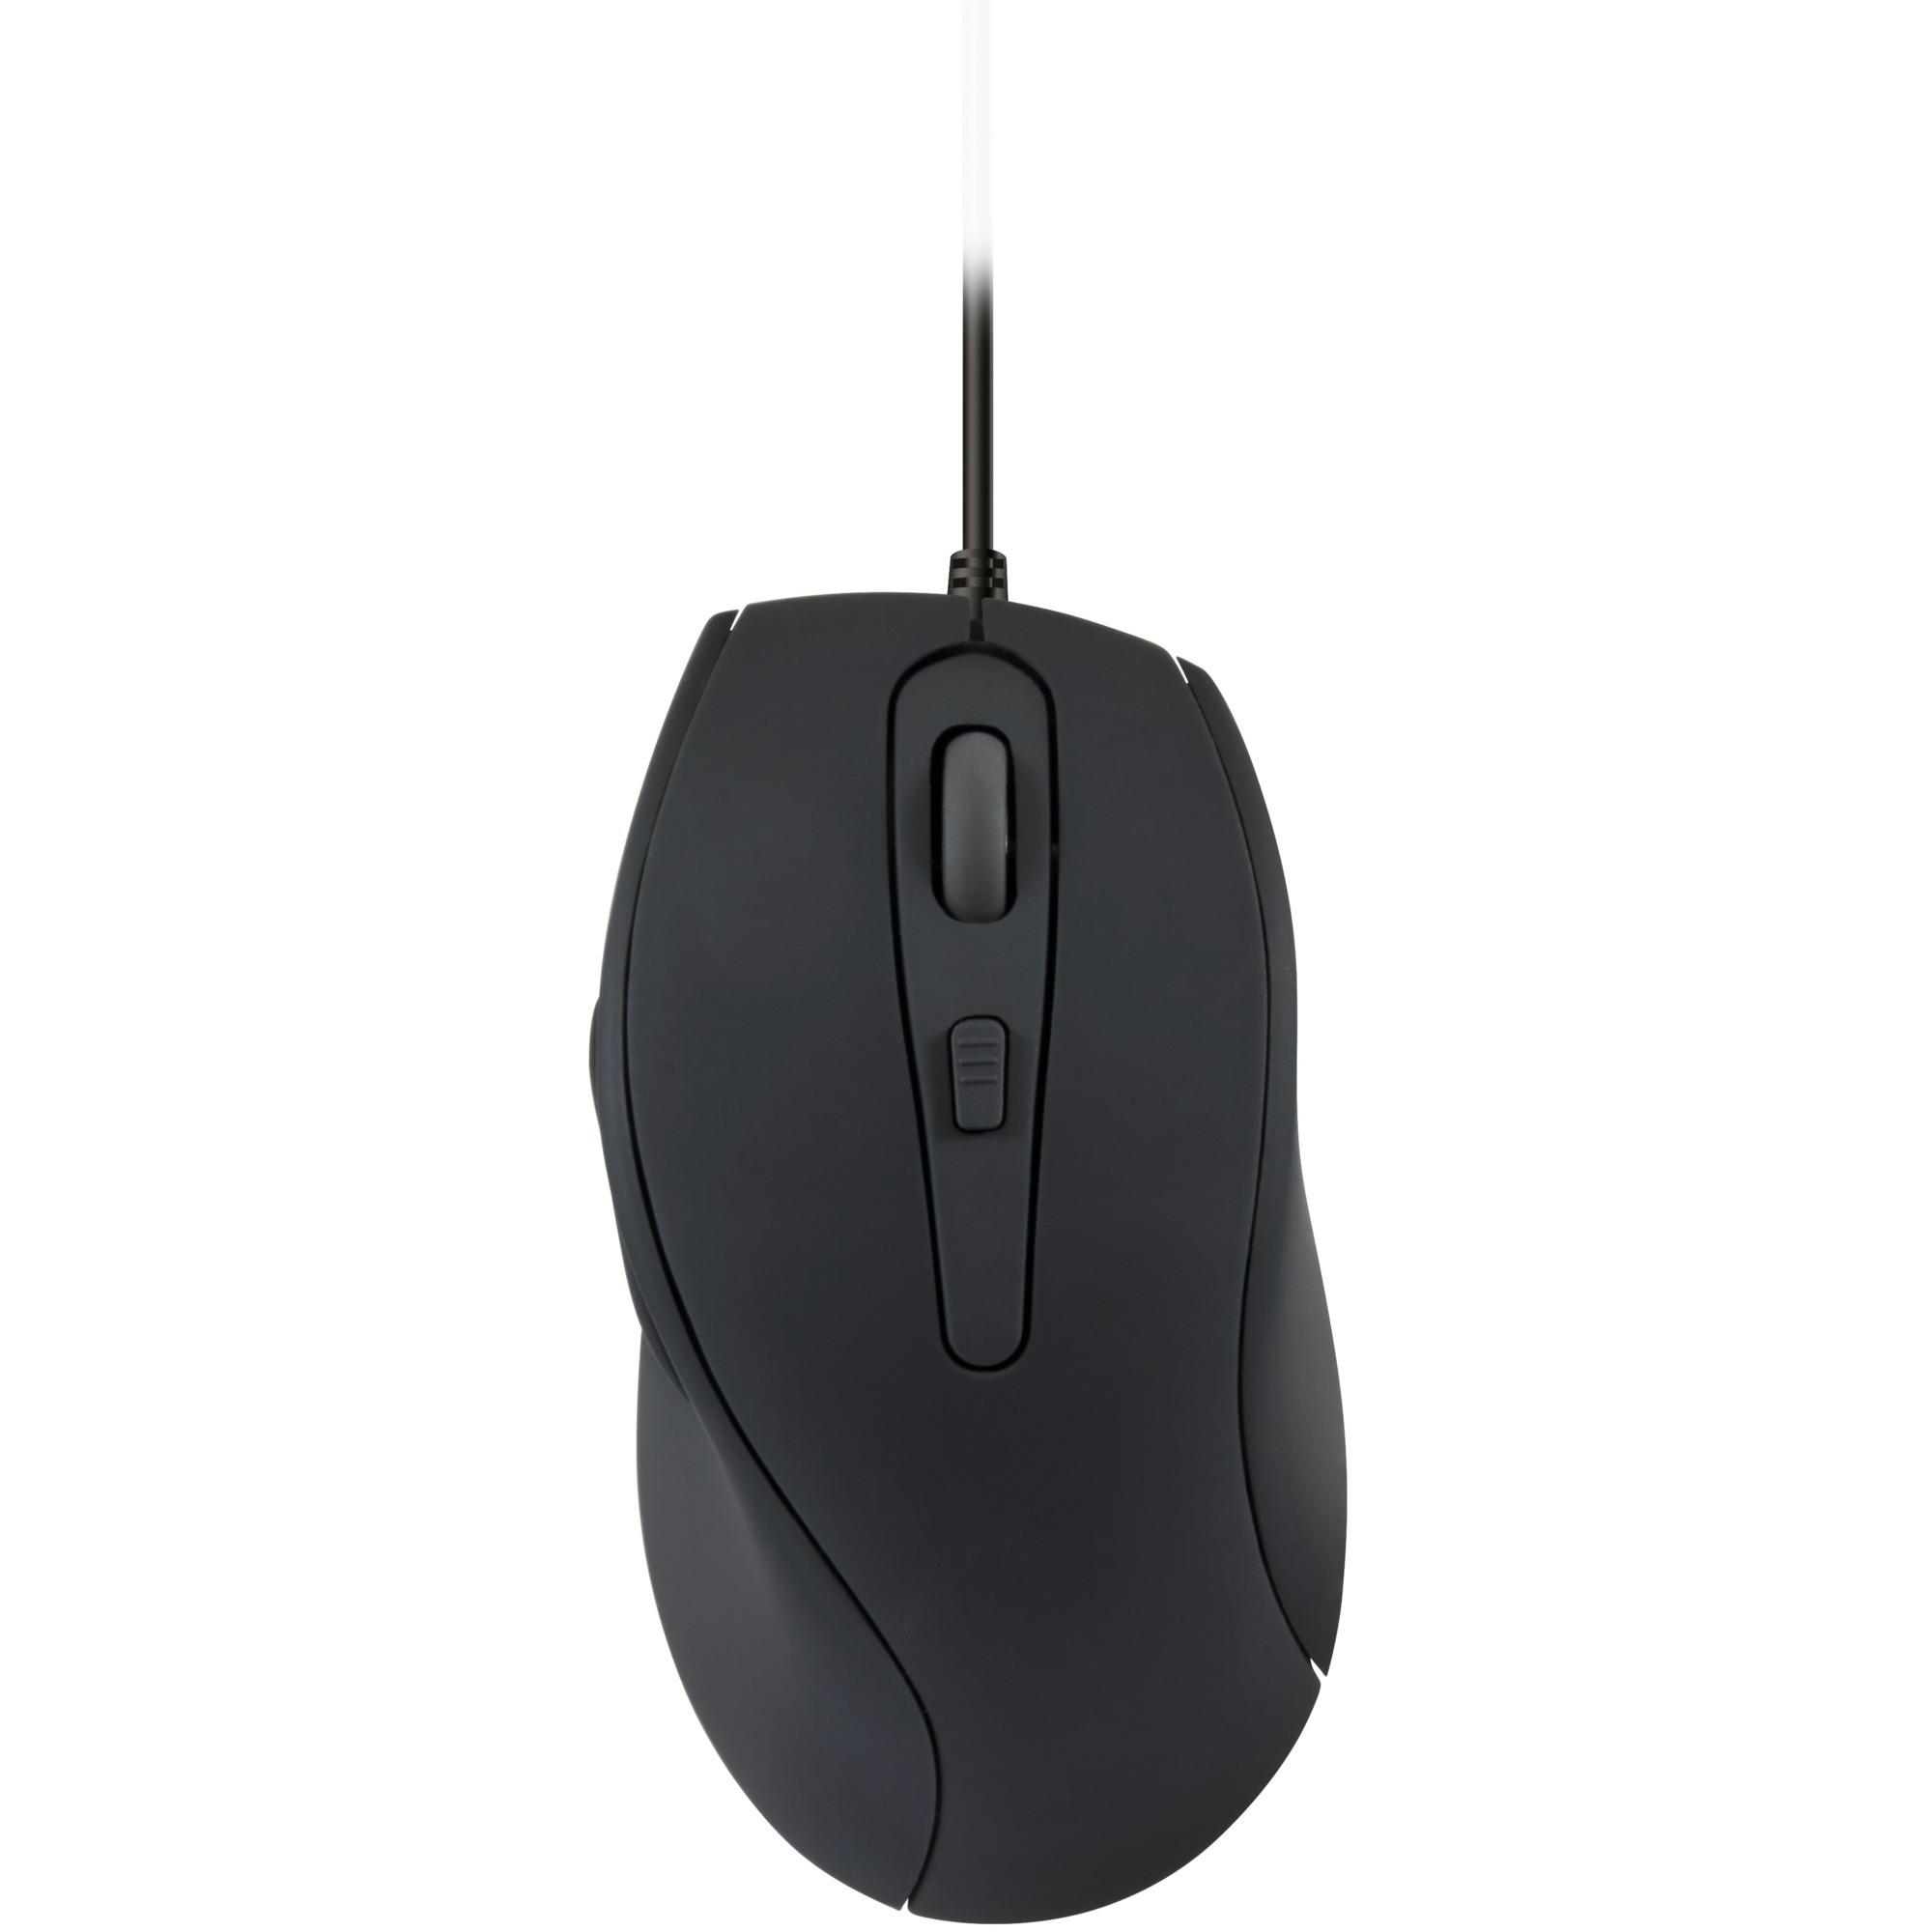 AXON ratón USB Óptico 2400 DPI mano derecha